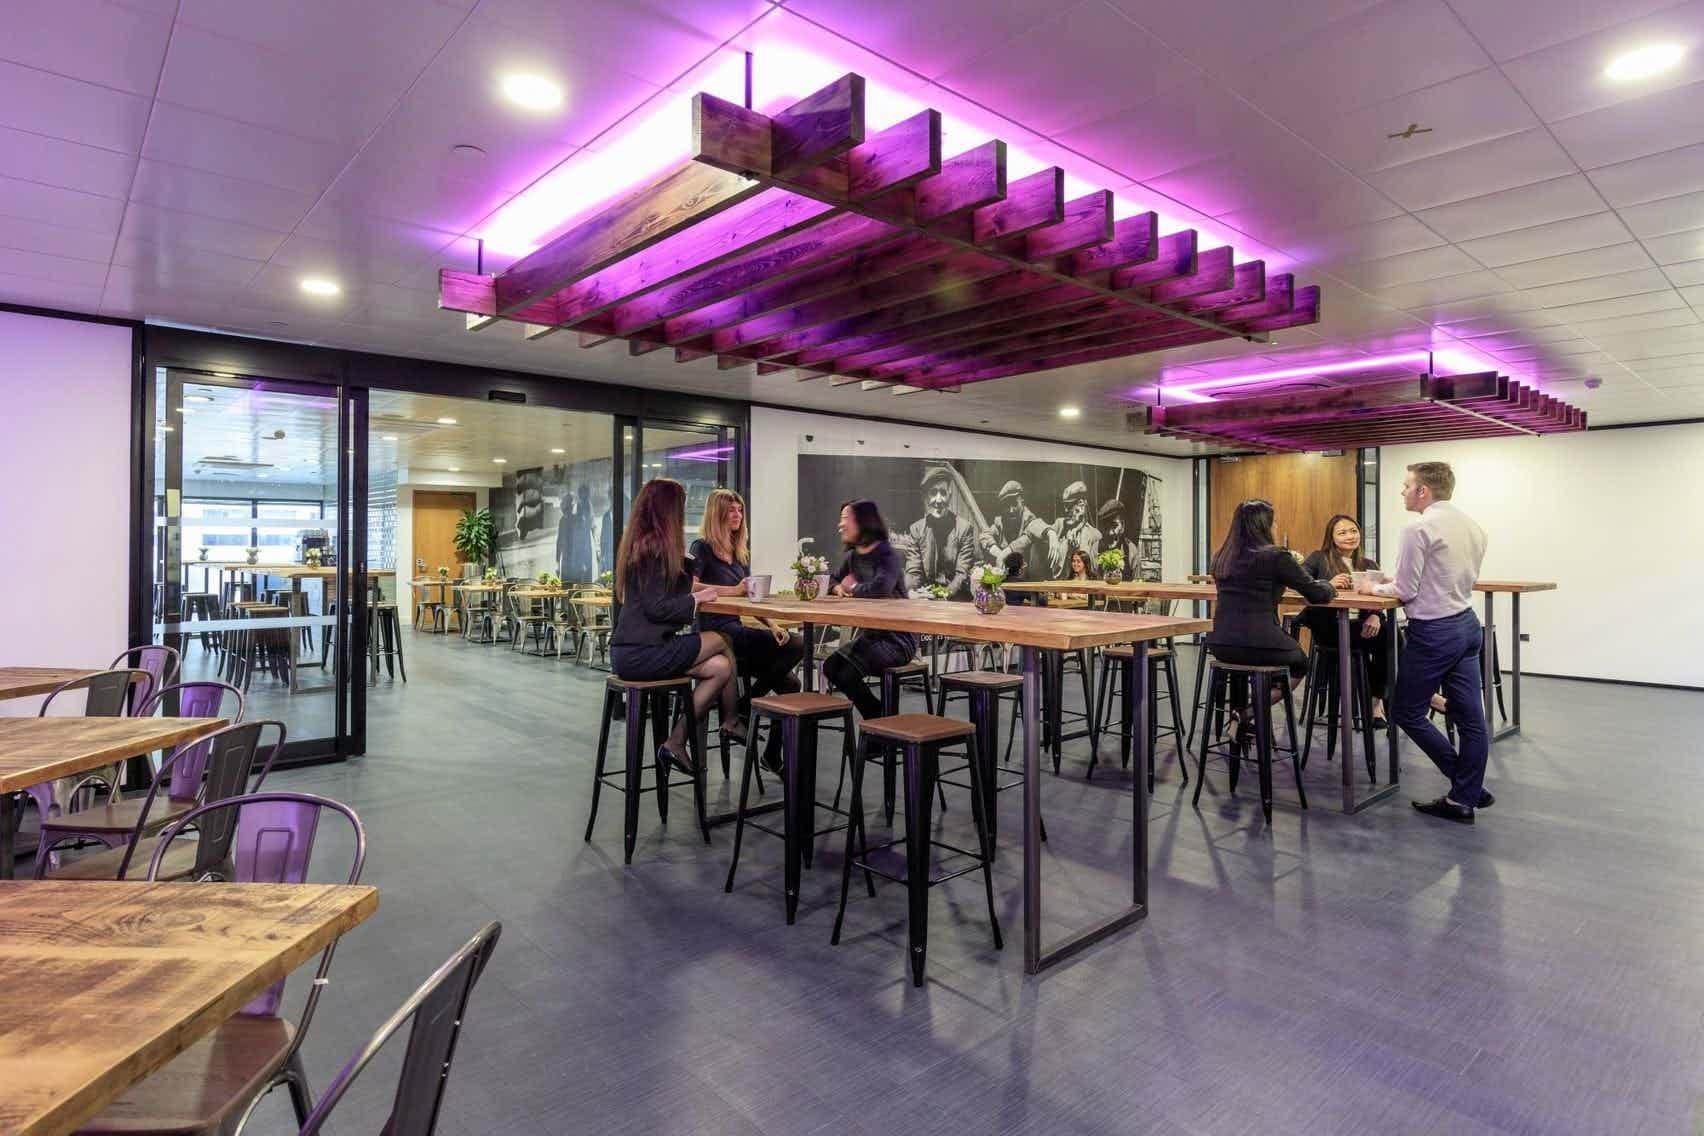 Dockers Restaurant, CCT Venues-Docklands (Canary Wharf)